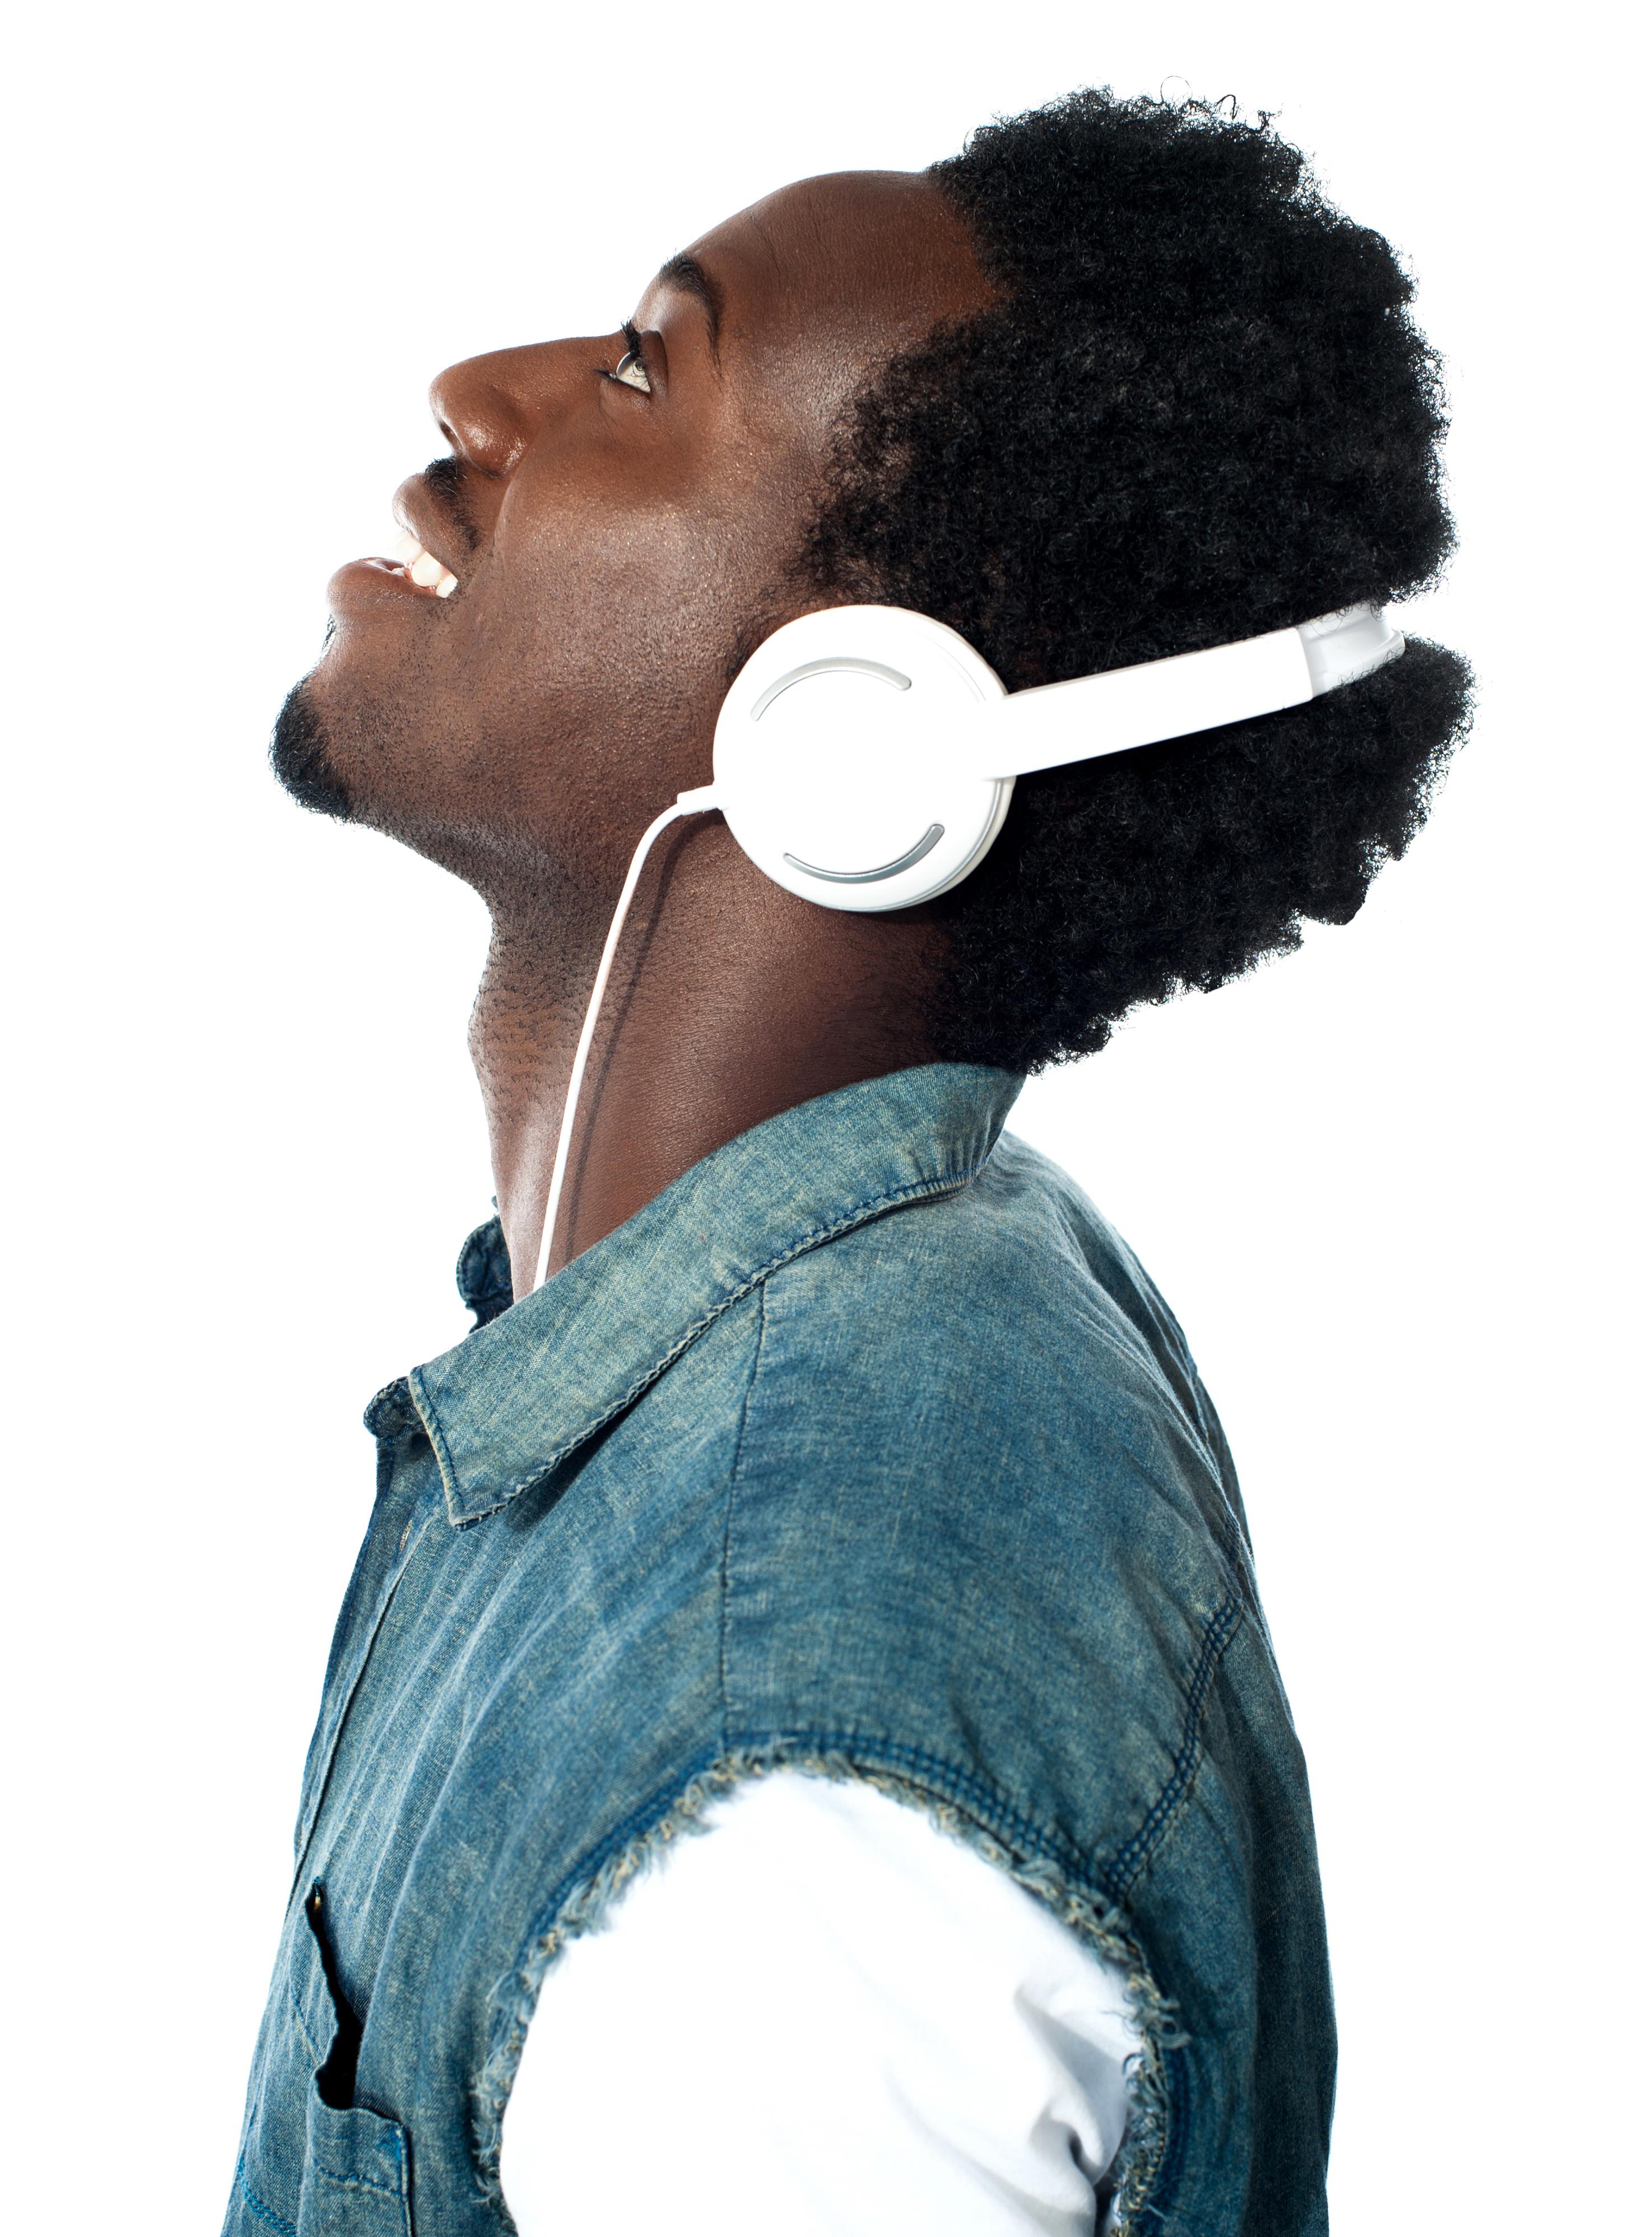 Listening Music Png Image Music Music Headphones Listening